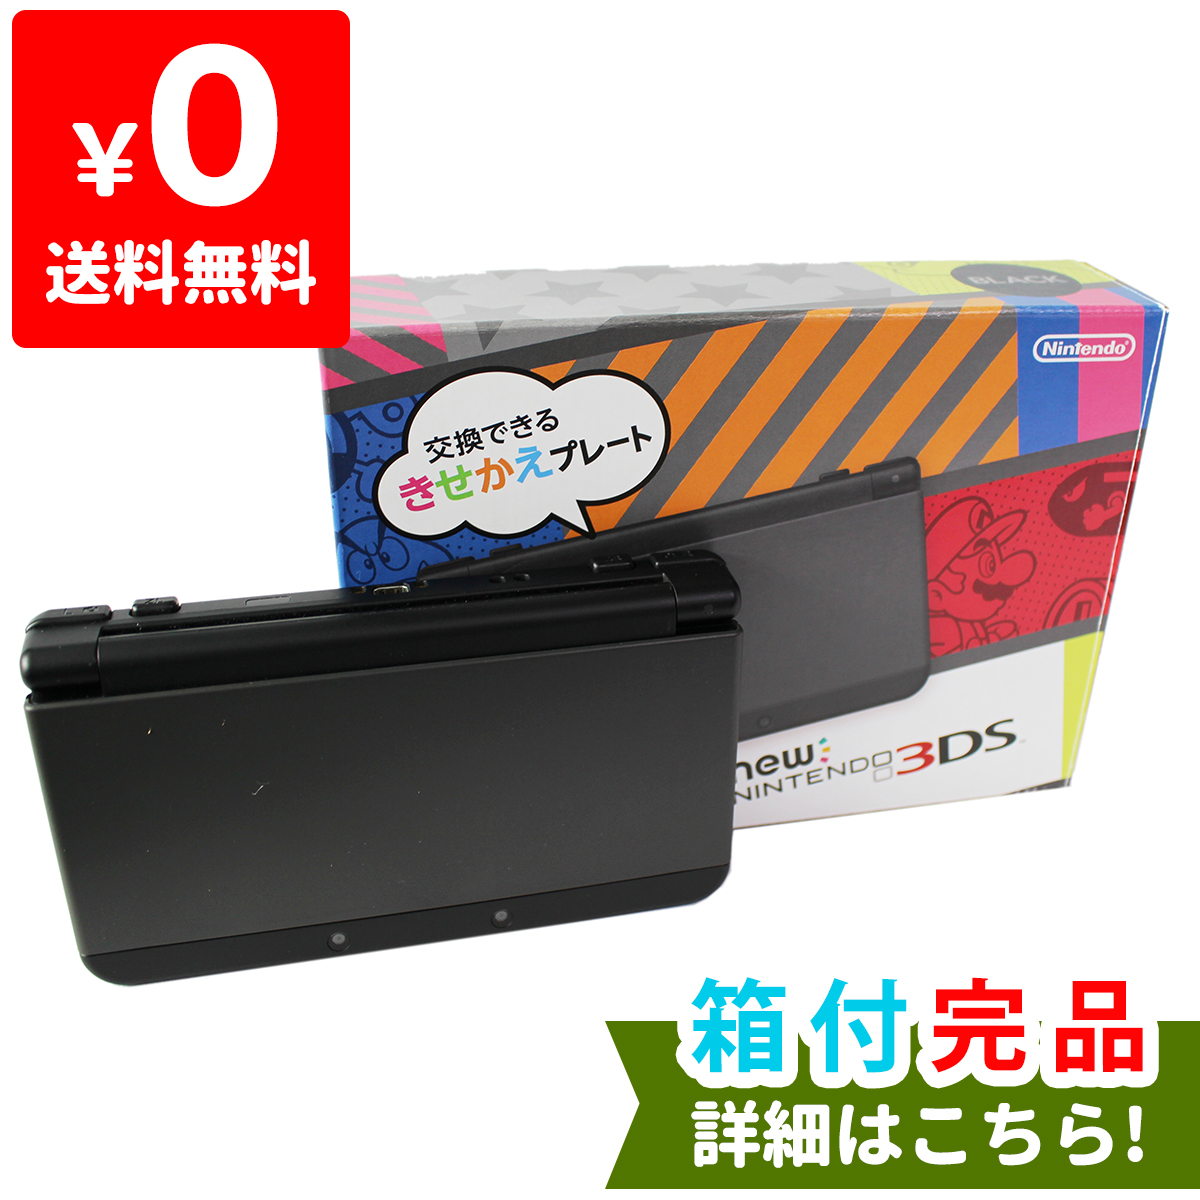 New3DS 本体 ブラック ニンテンドー 任天堂 Nintendo ゲーム機 中古 4902370522167 送料無料